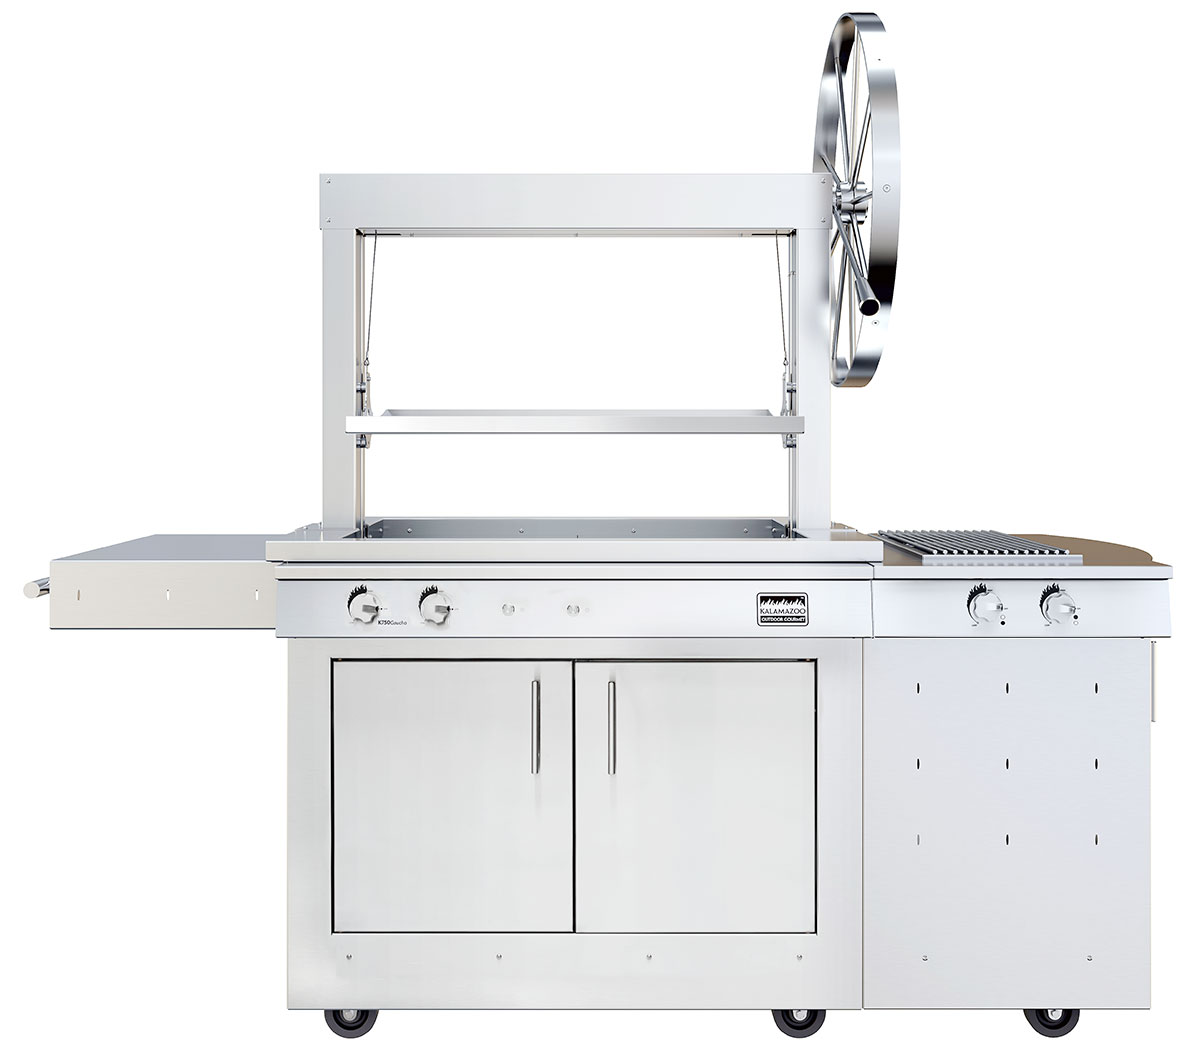 k750gs-gaucho-grill-larger.jpg